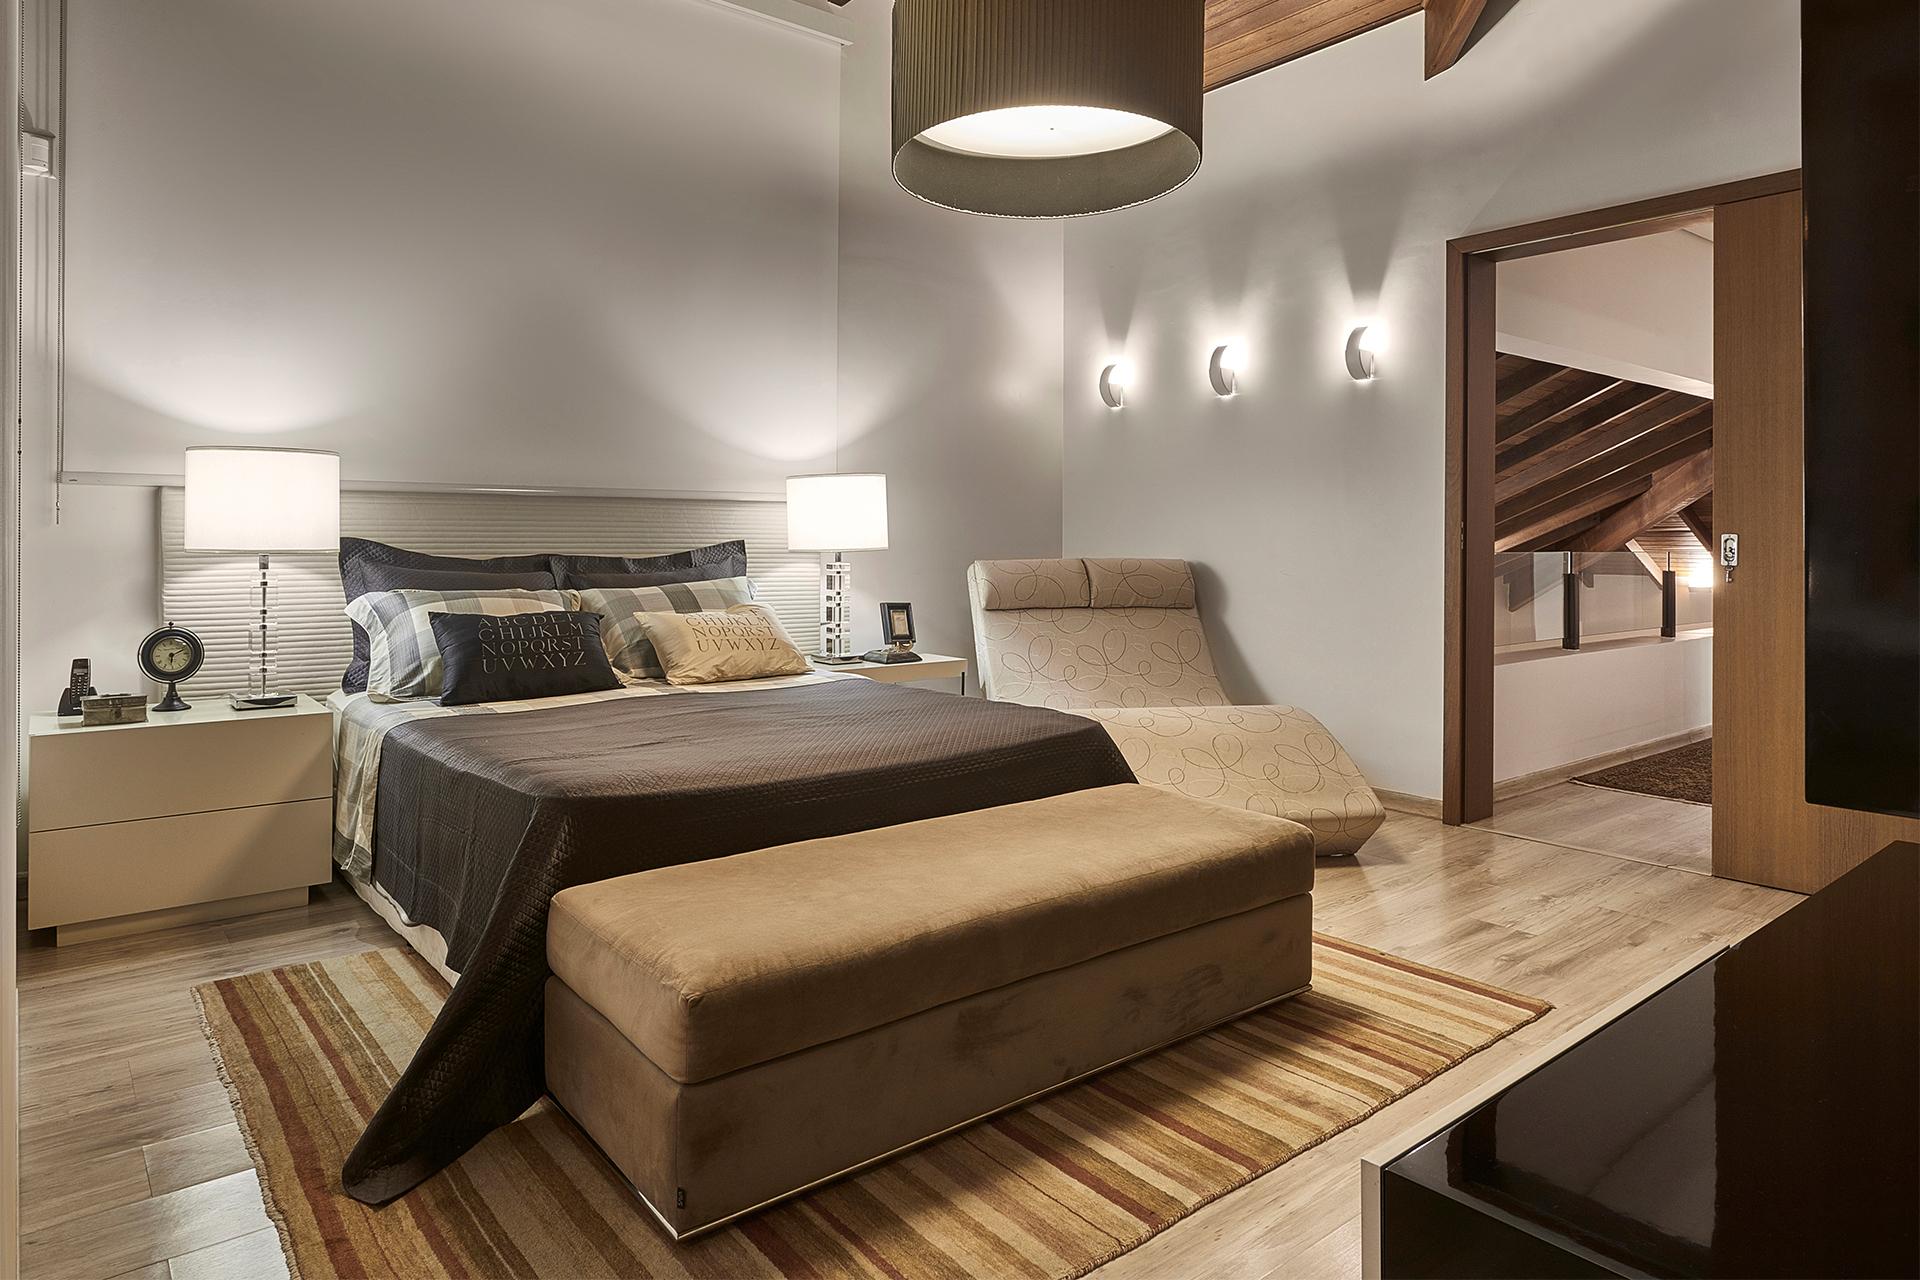 projetos_casas (13)